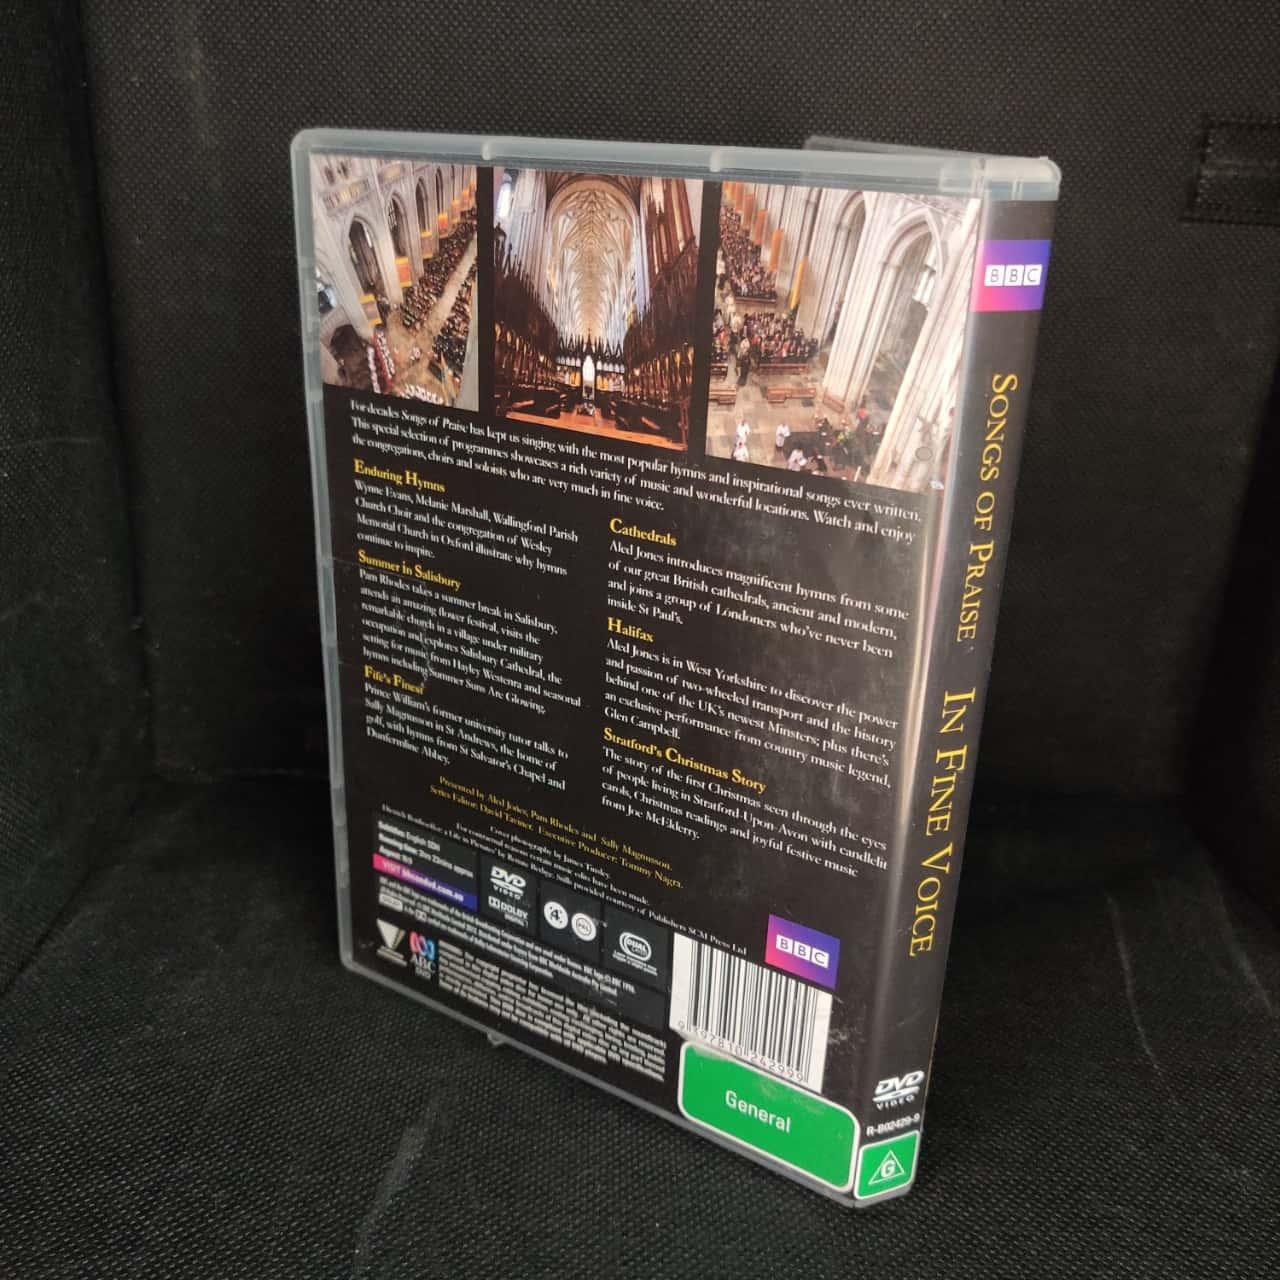 BBC Songs Of Praise DVD - In Fine Voice